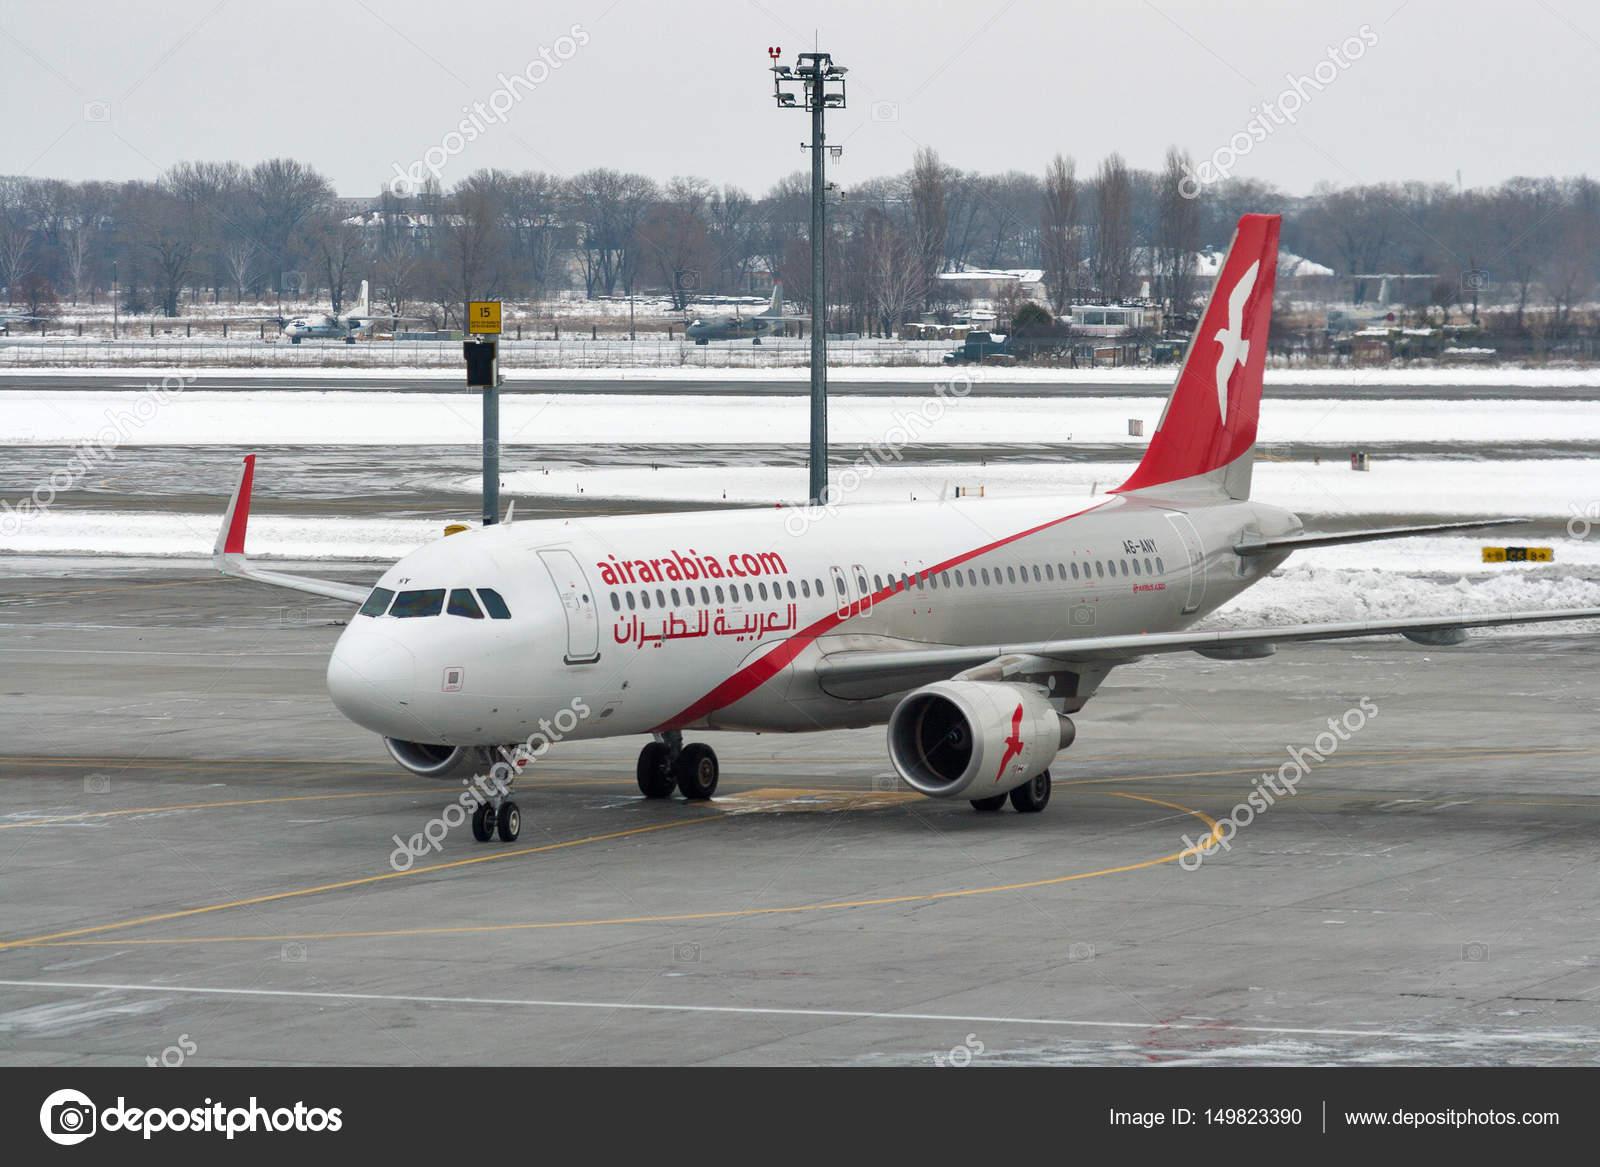 Aeroporto Kiev : Avião da arábia ar em boryspil aeroporto kiev ucr nia